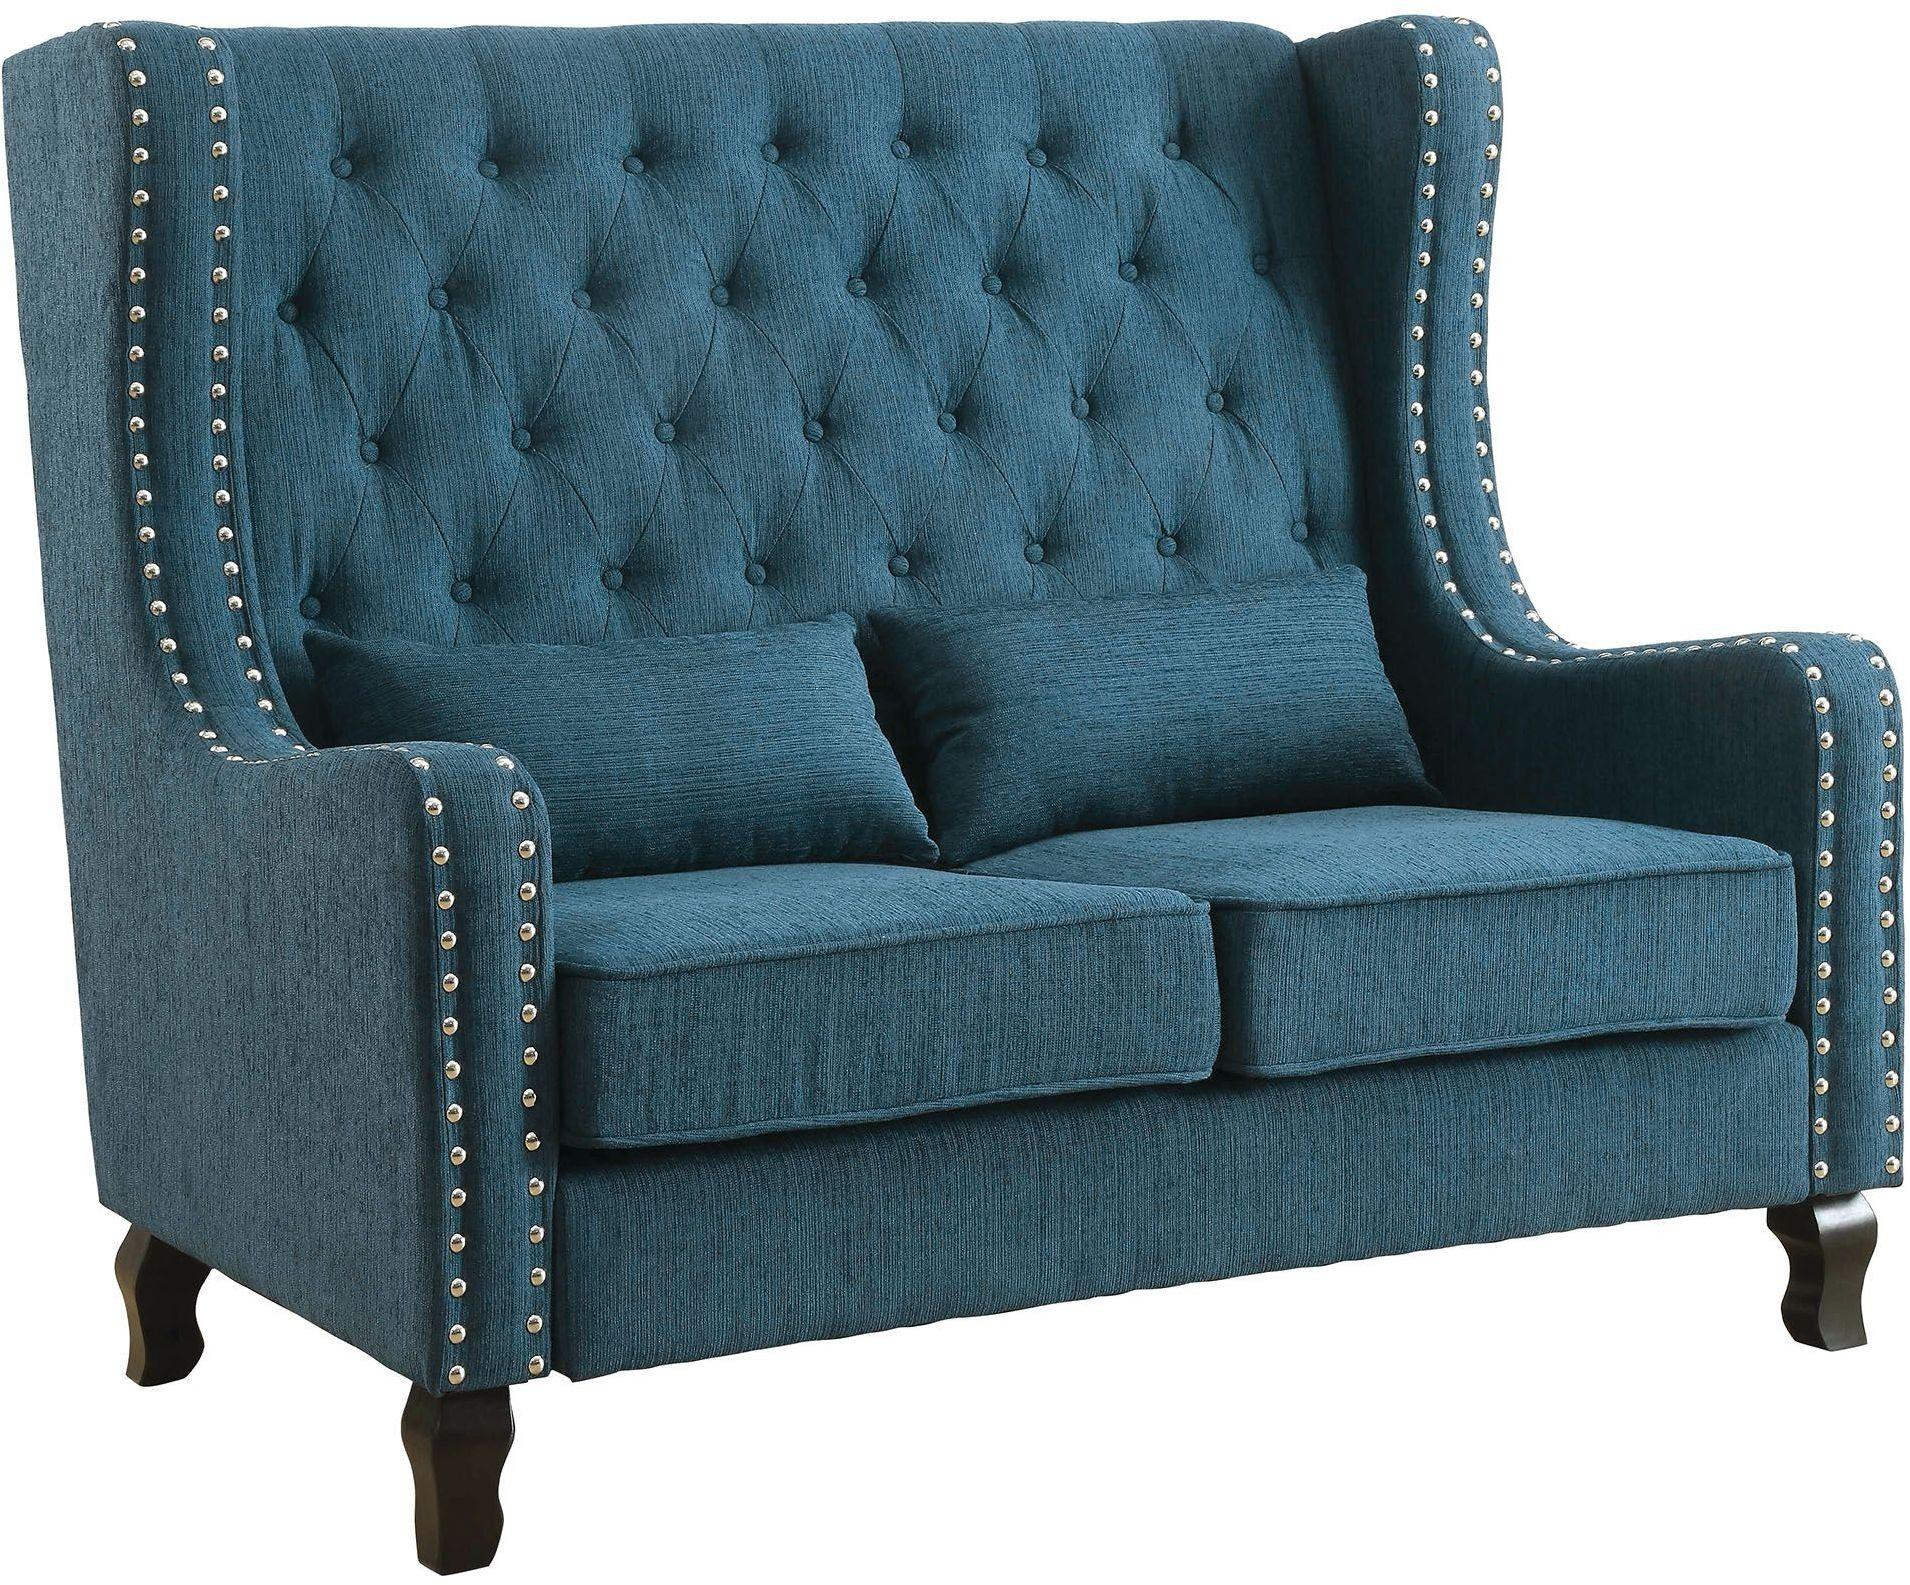 dark teal accent chair pedicure chairs alicante loveseat bench cm bn6449tl pk